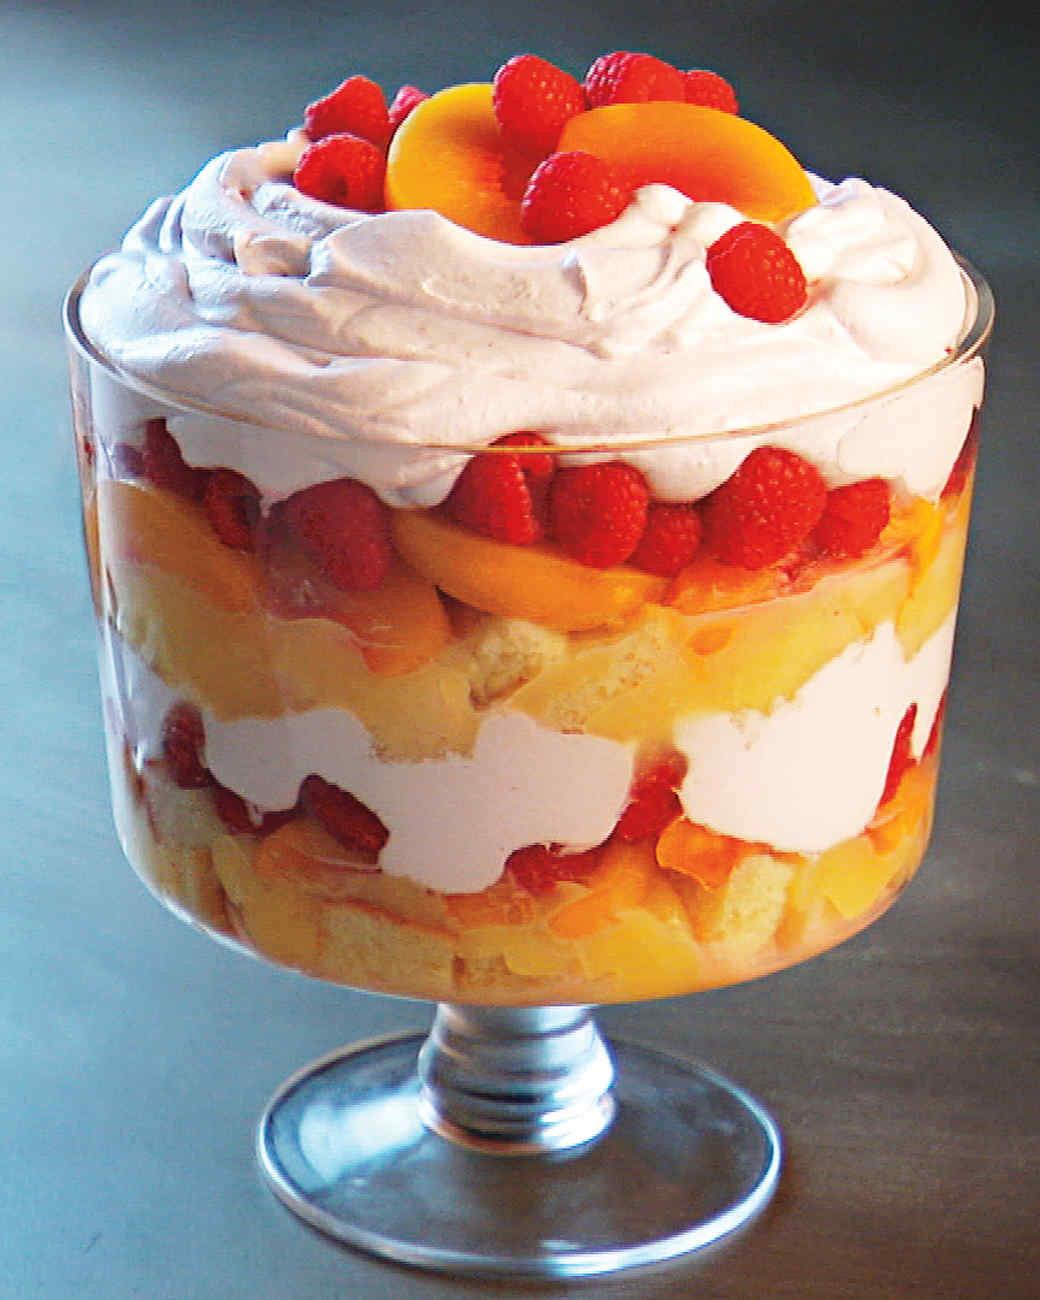 Triffle Dessert Recipe  12 Impressive Holiday Trifle Recipes